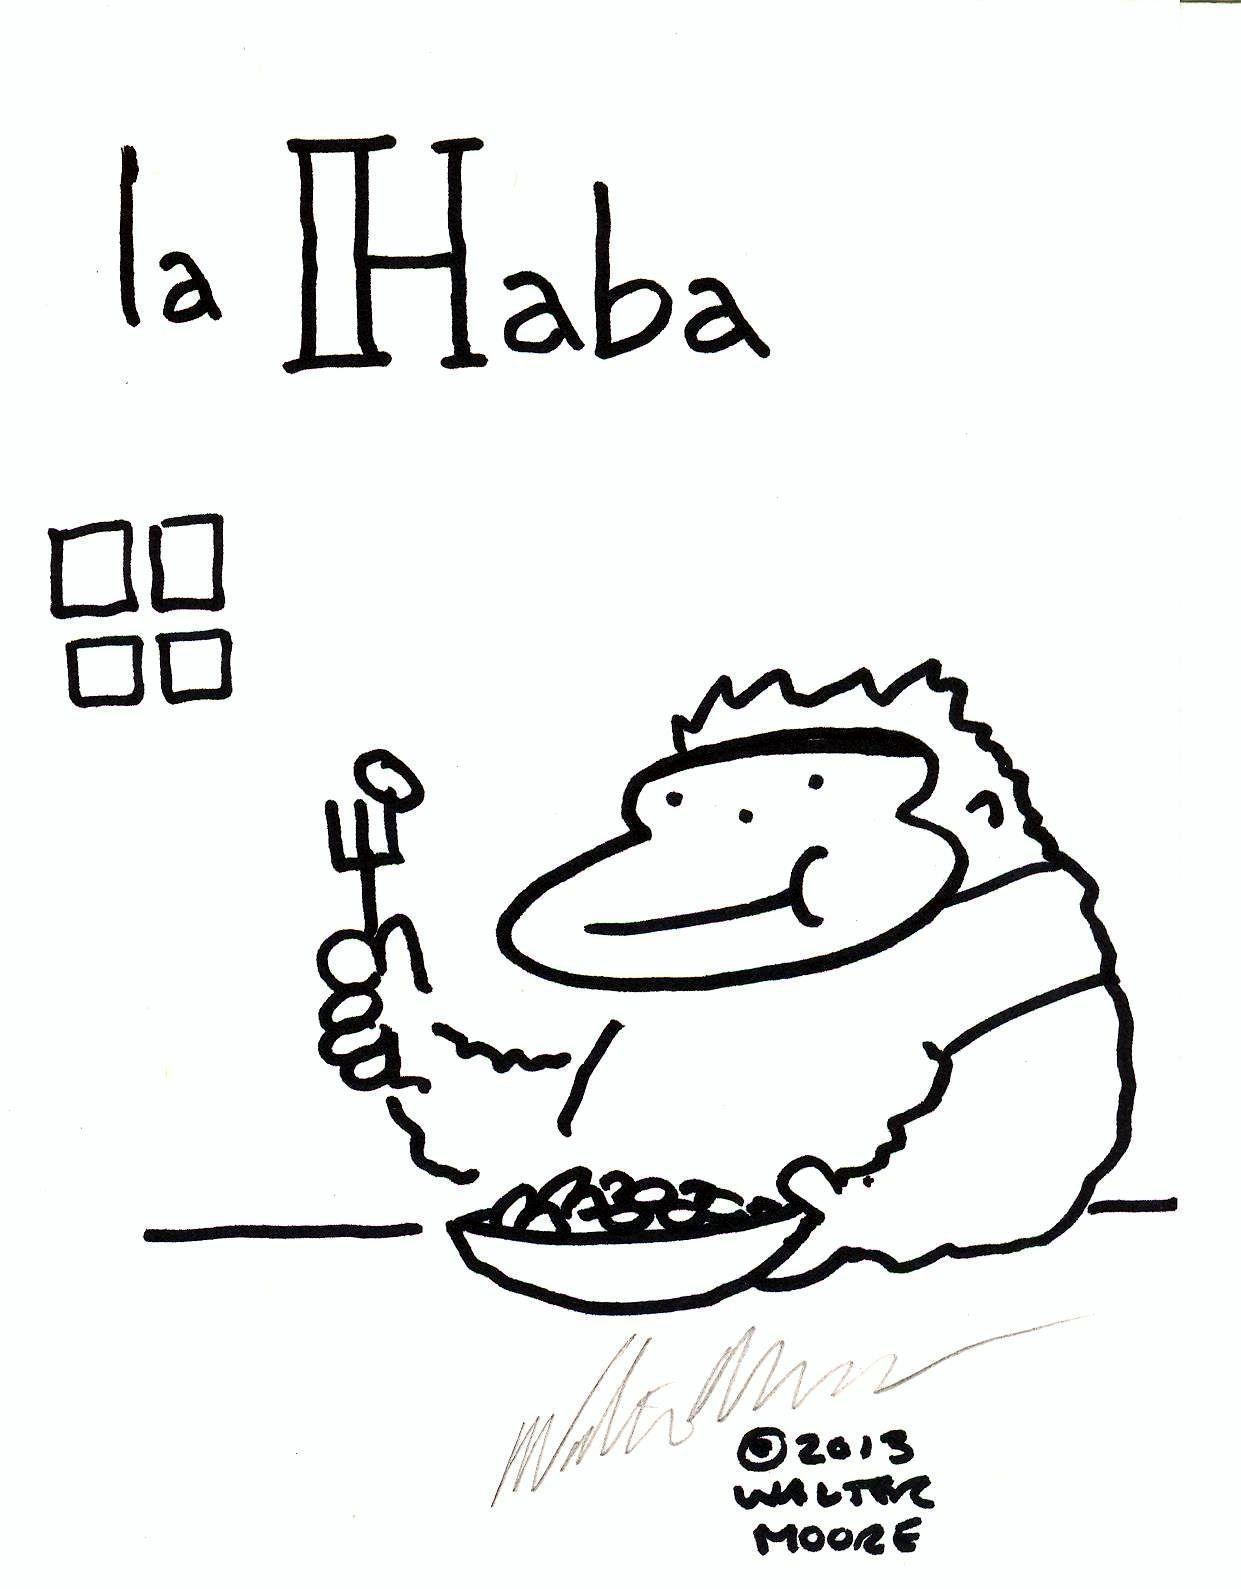 Spanish Apes: La Haba. Original Signed Cartoon by Walter Moore